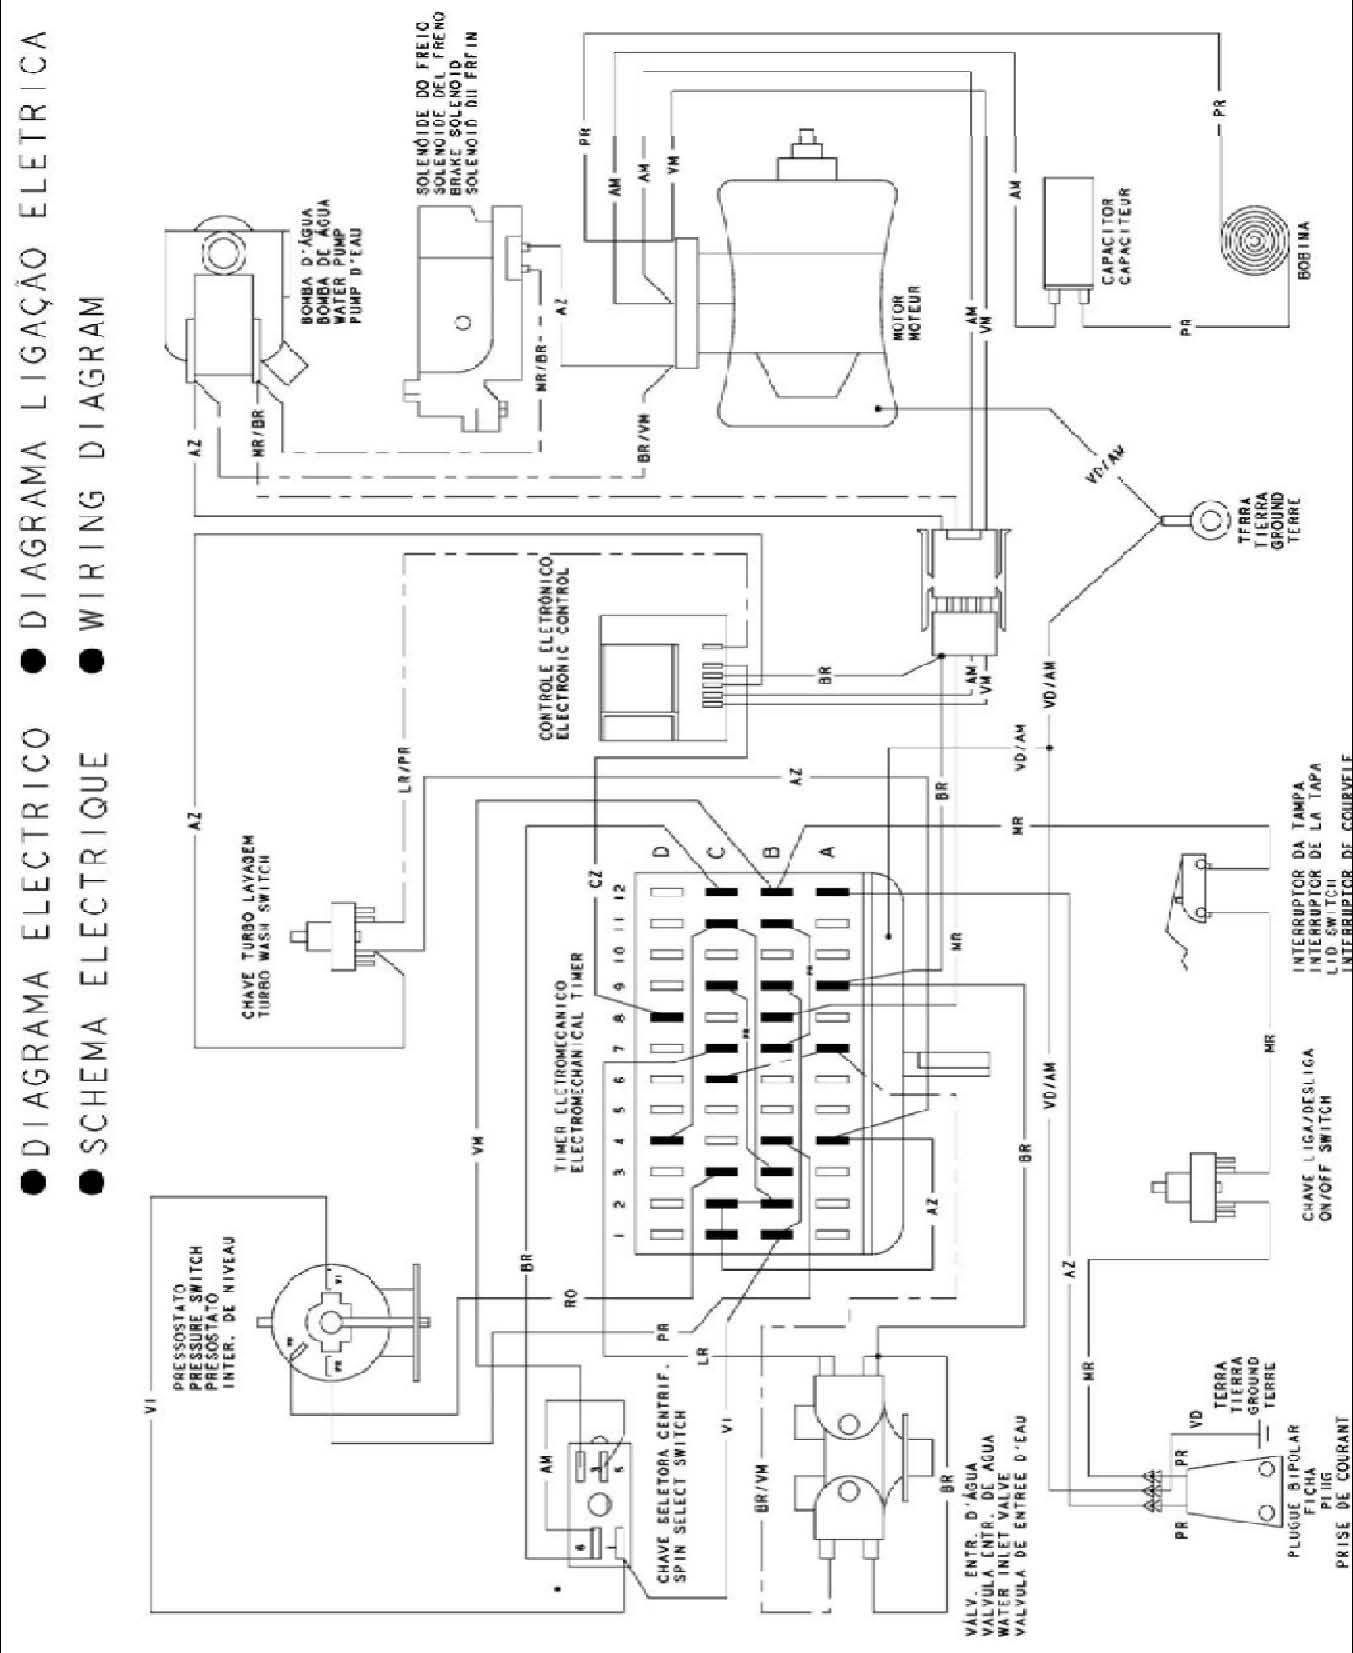 esquema electrico freezer neba f400 horizontal mod viejo